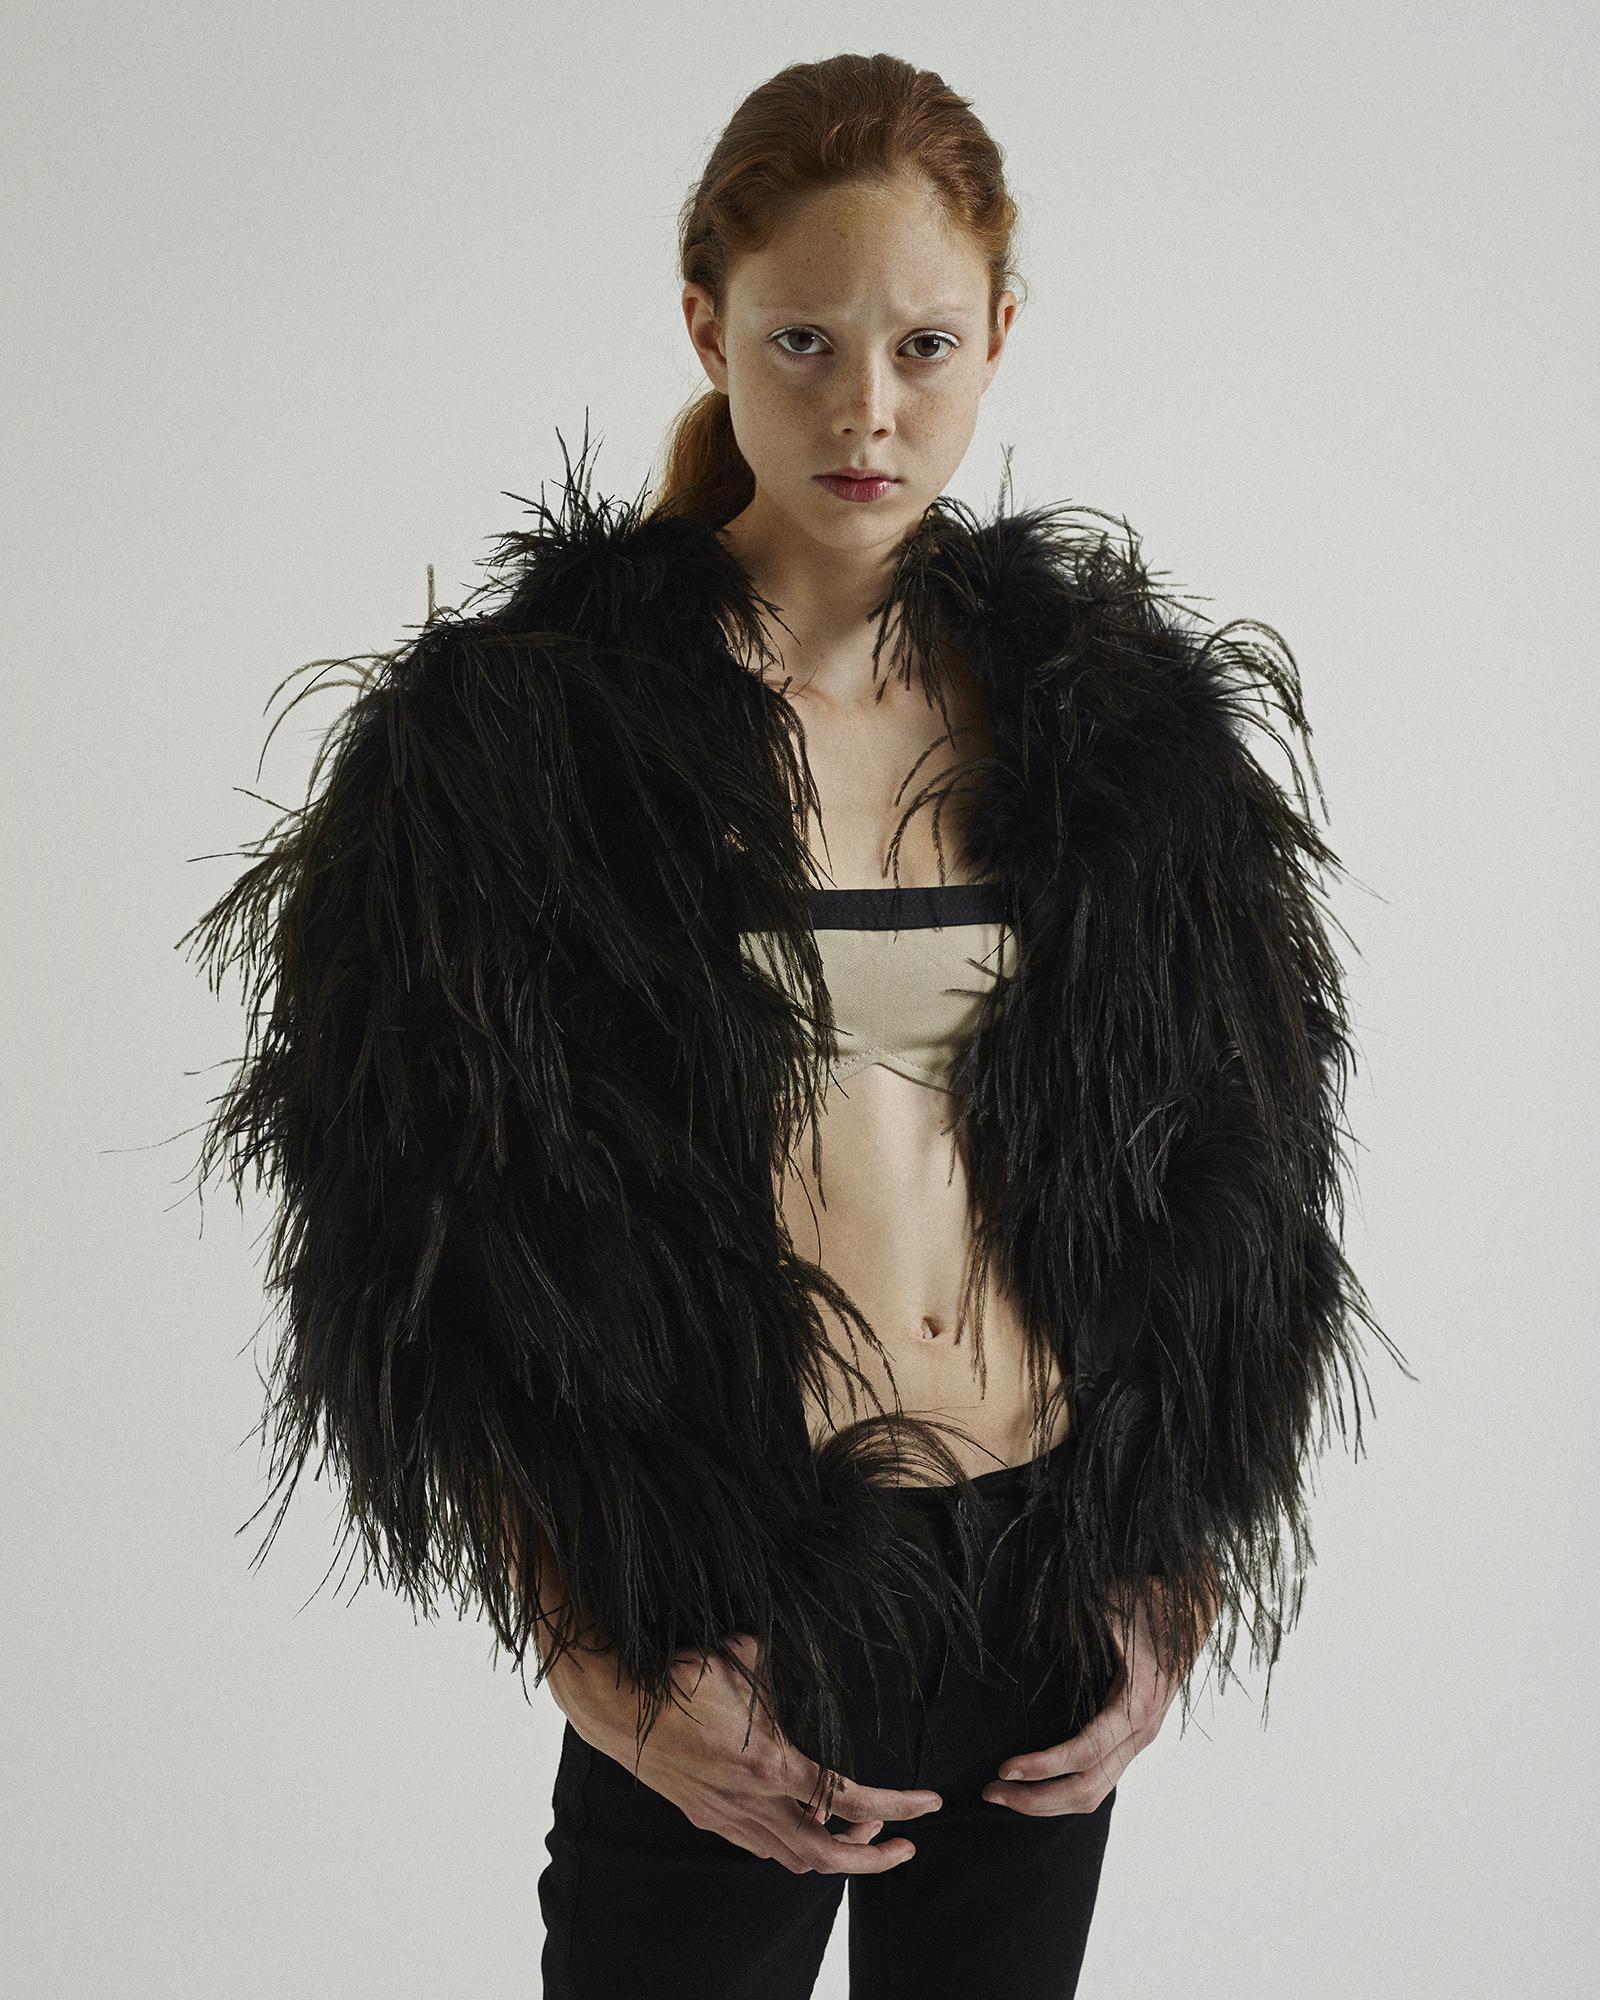 fashion_test_natalie15688 2.jpg